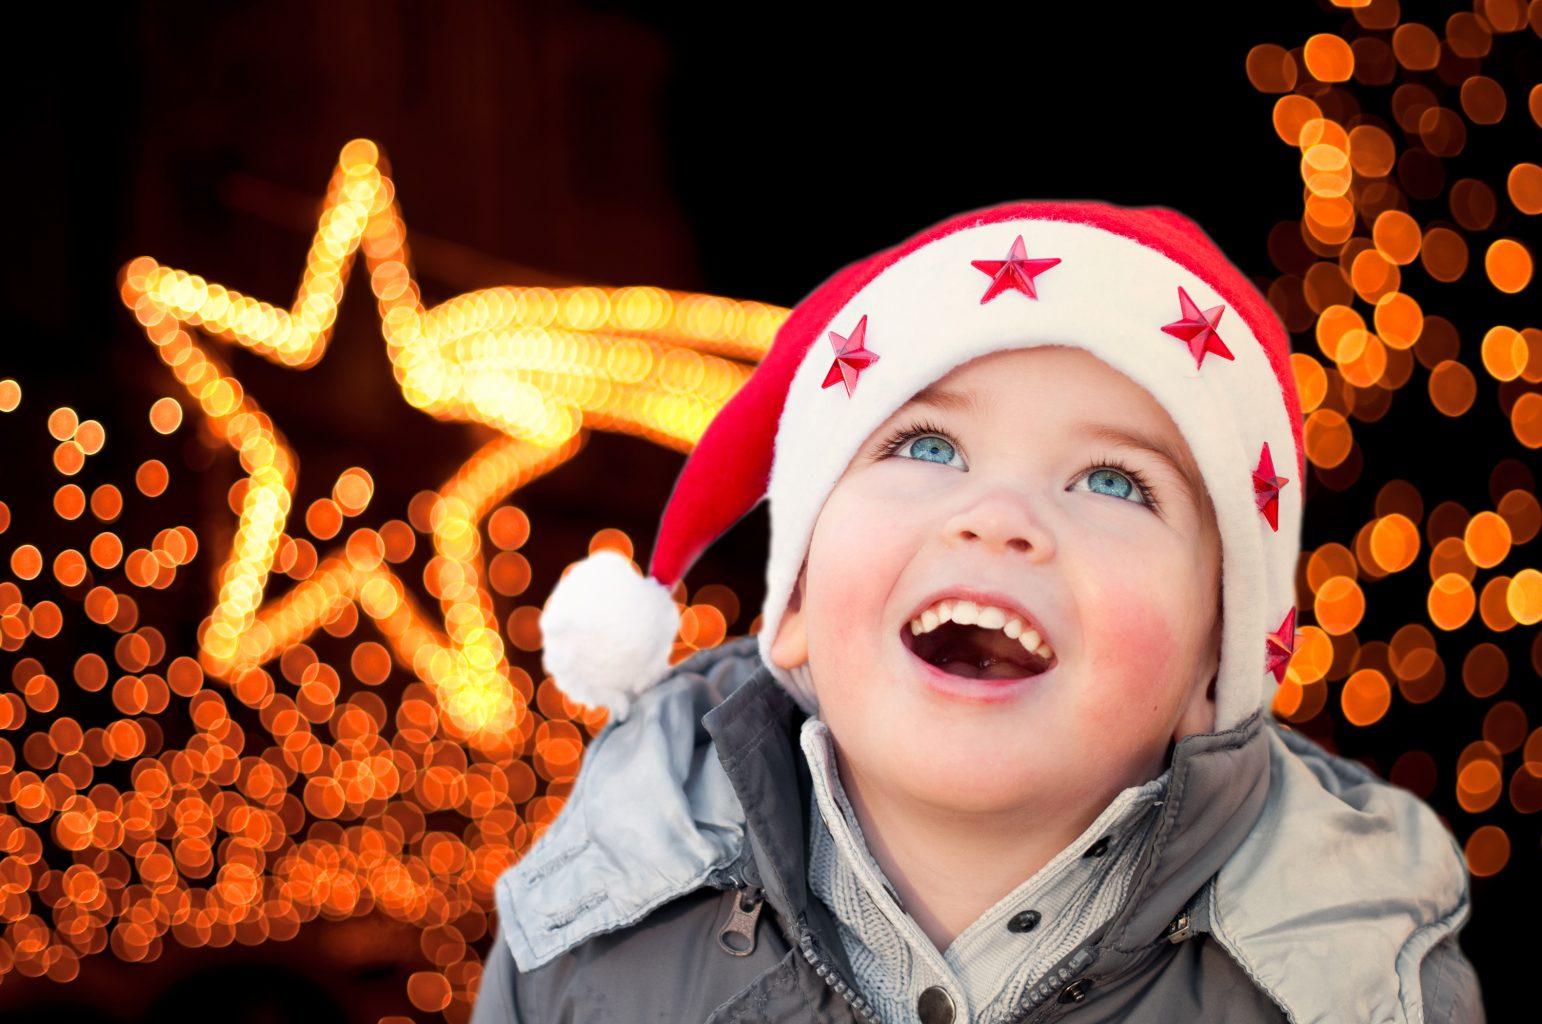 myrtle-beach-events-christmas-holidays